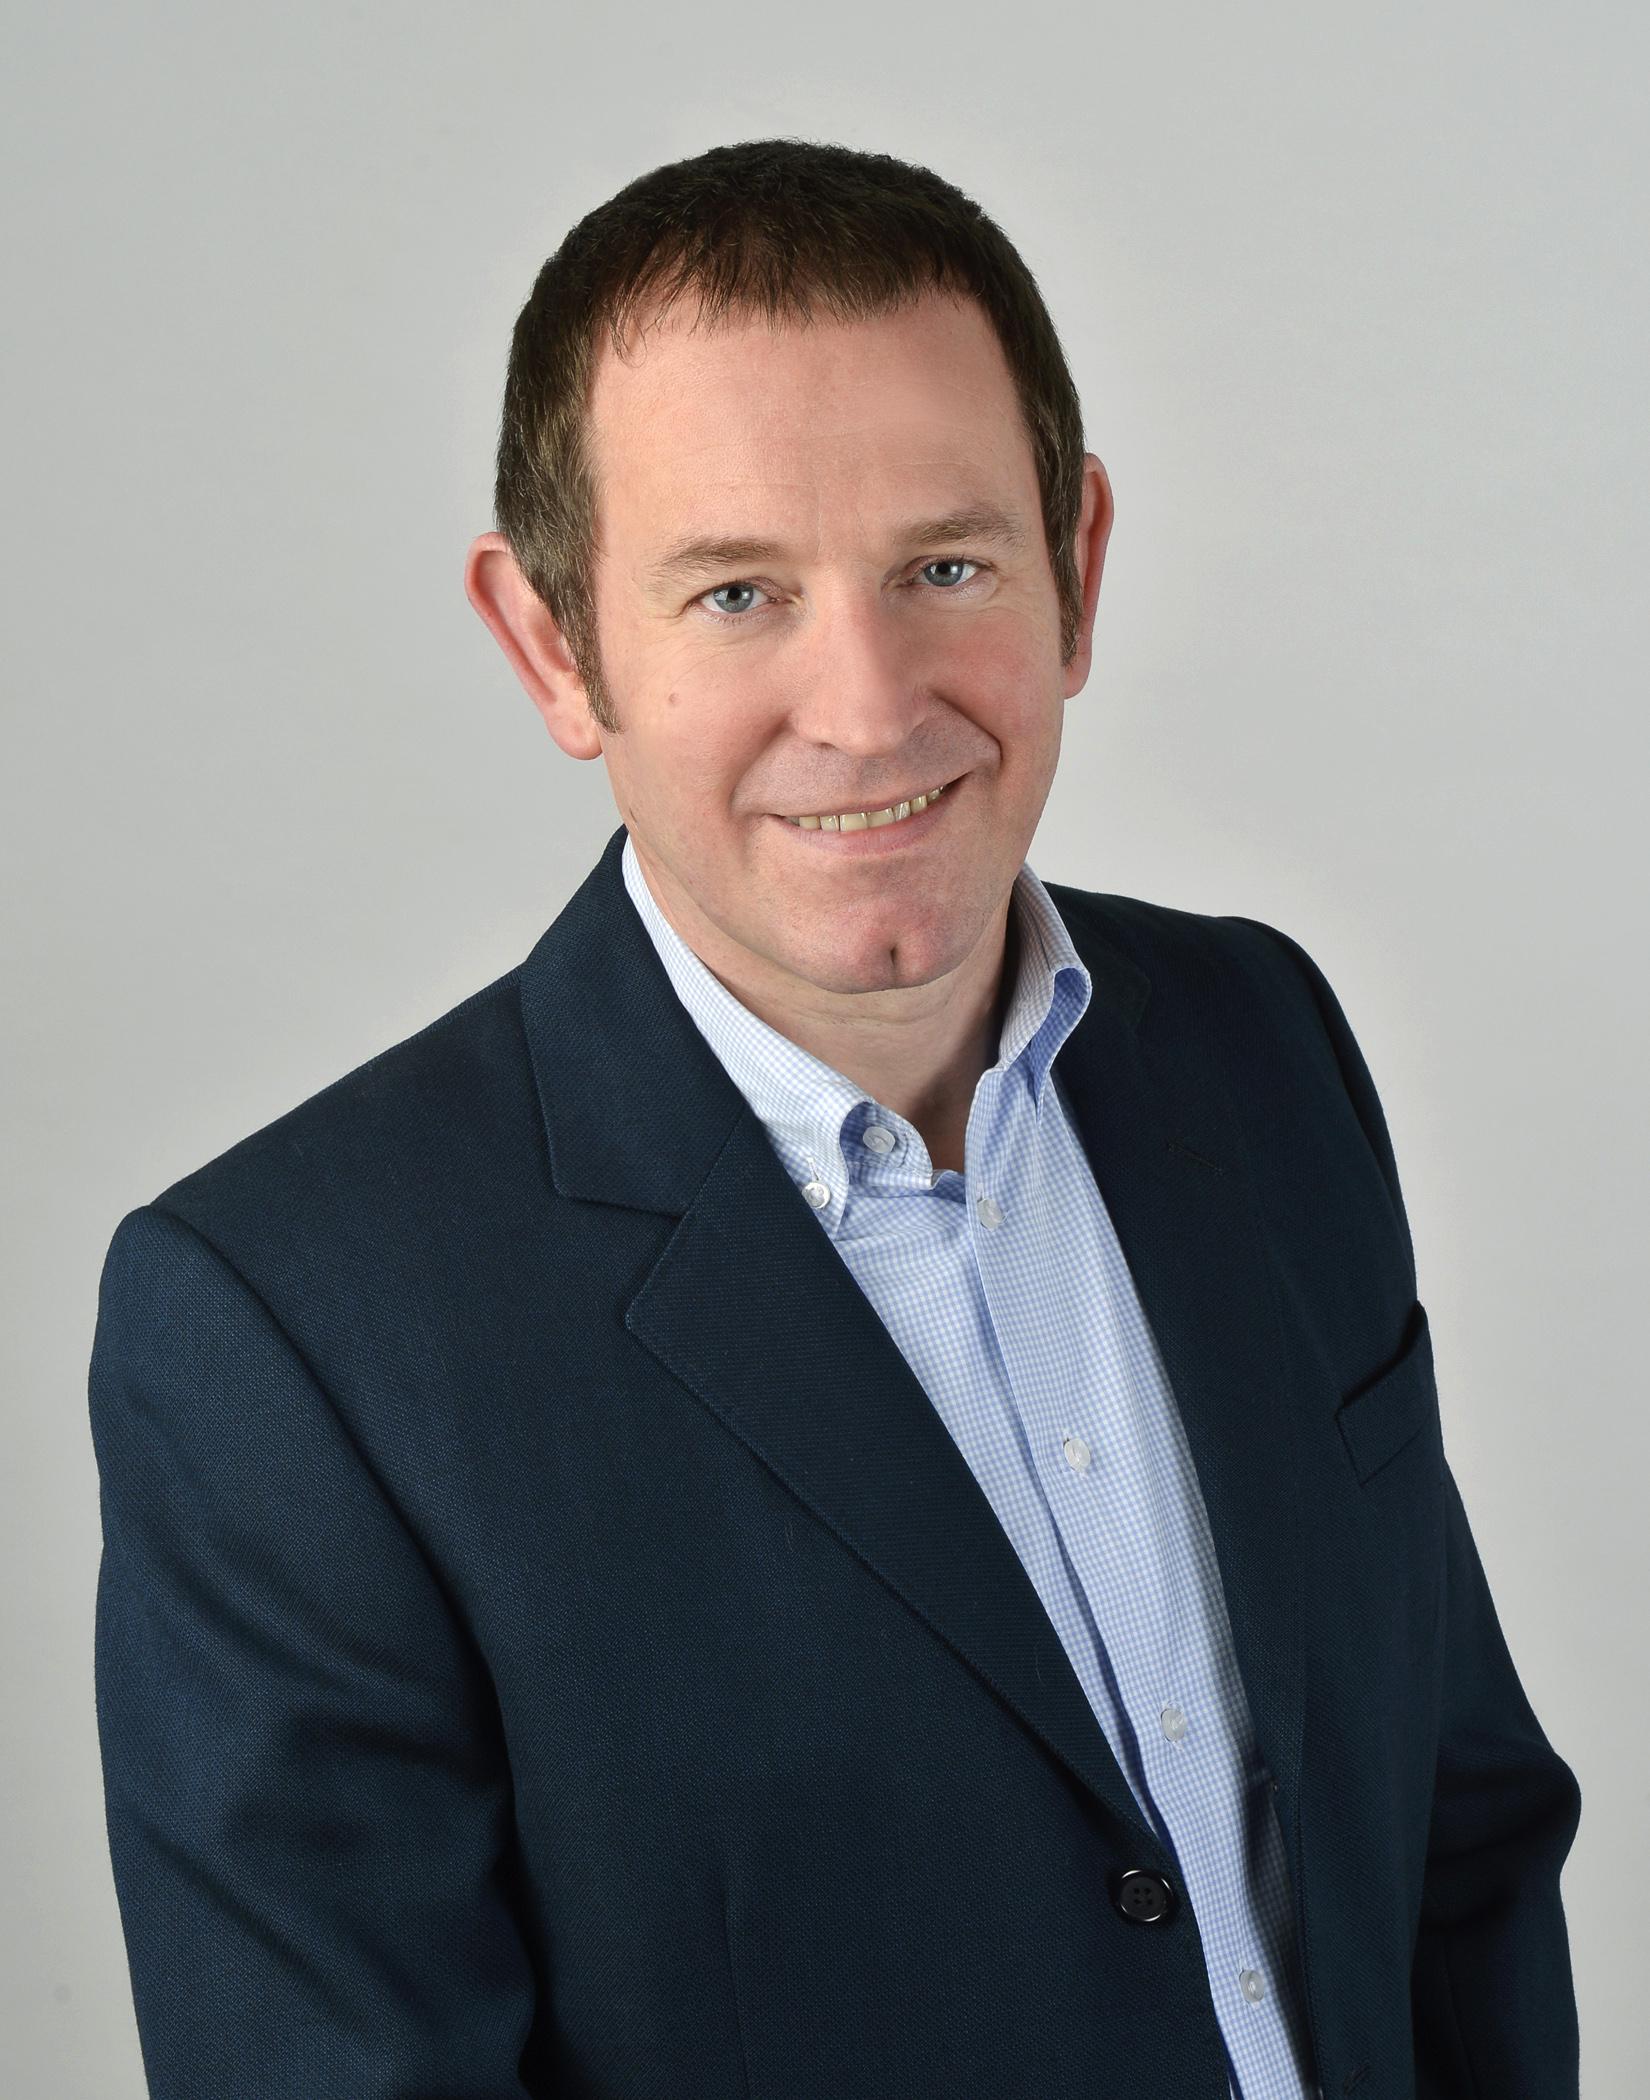 Nigel Langstaff